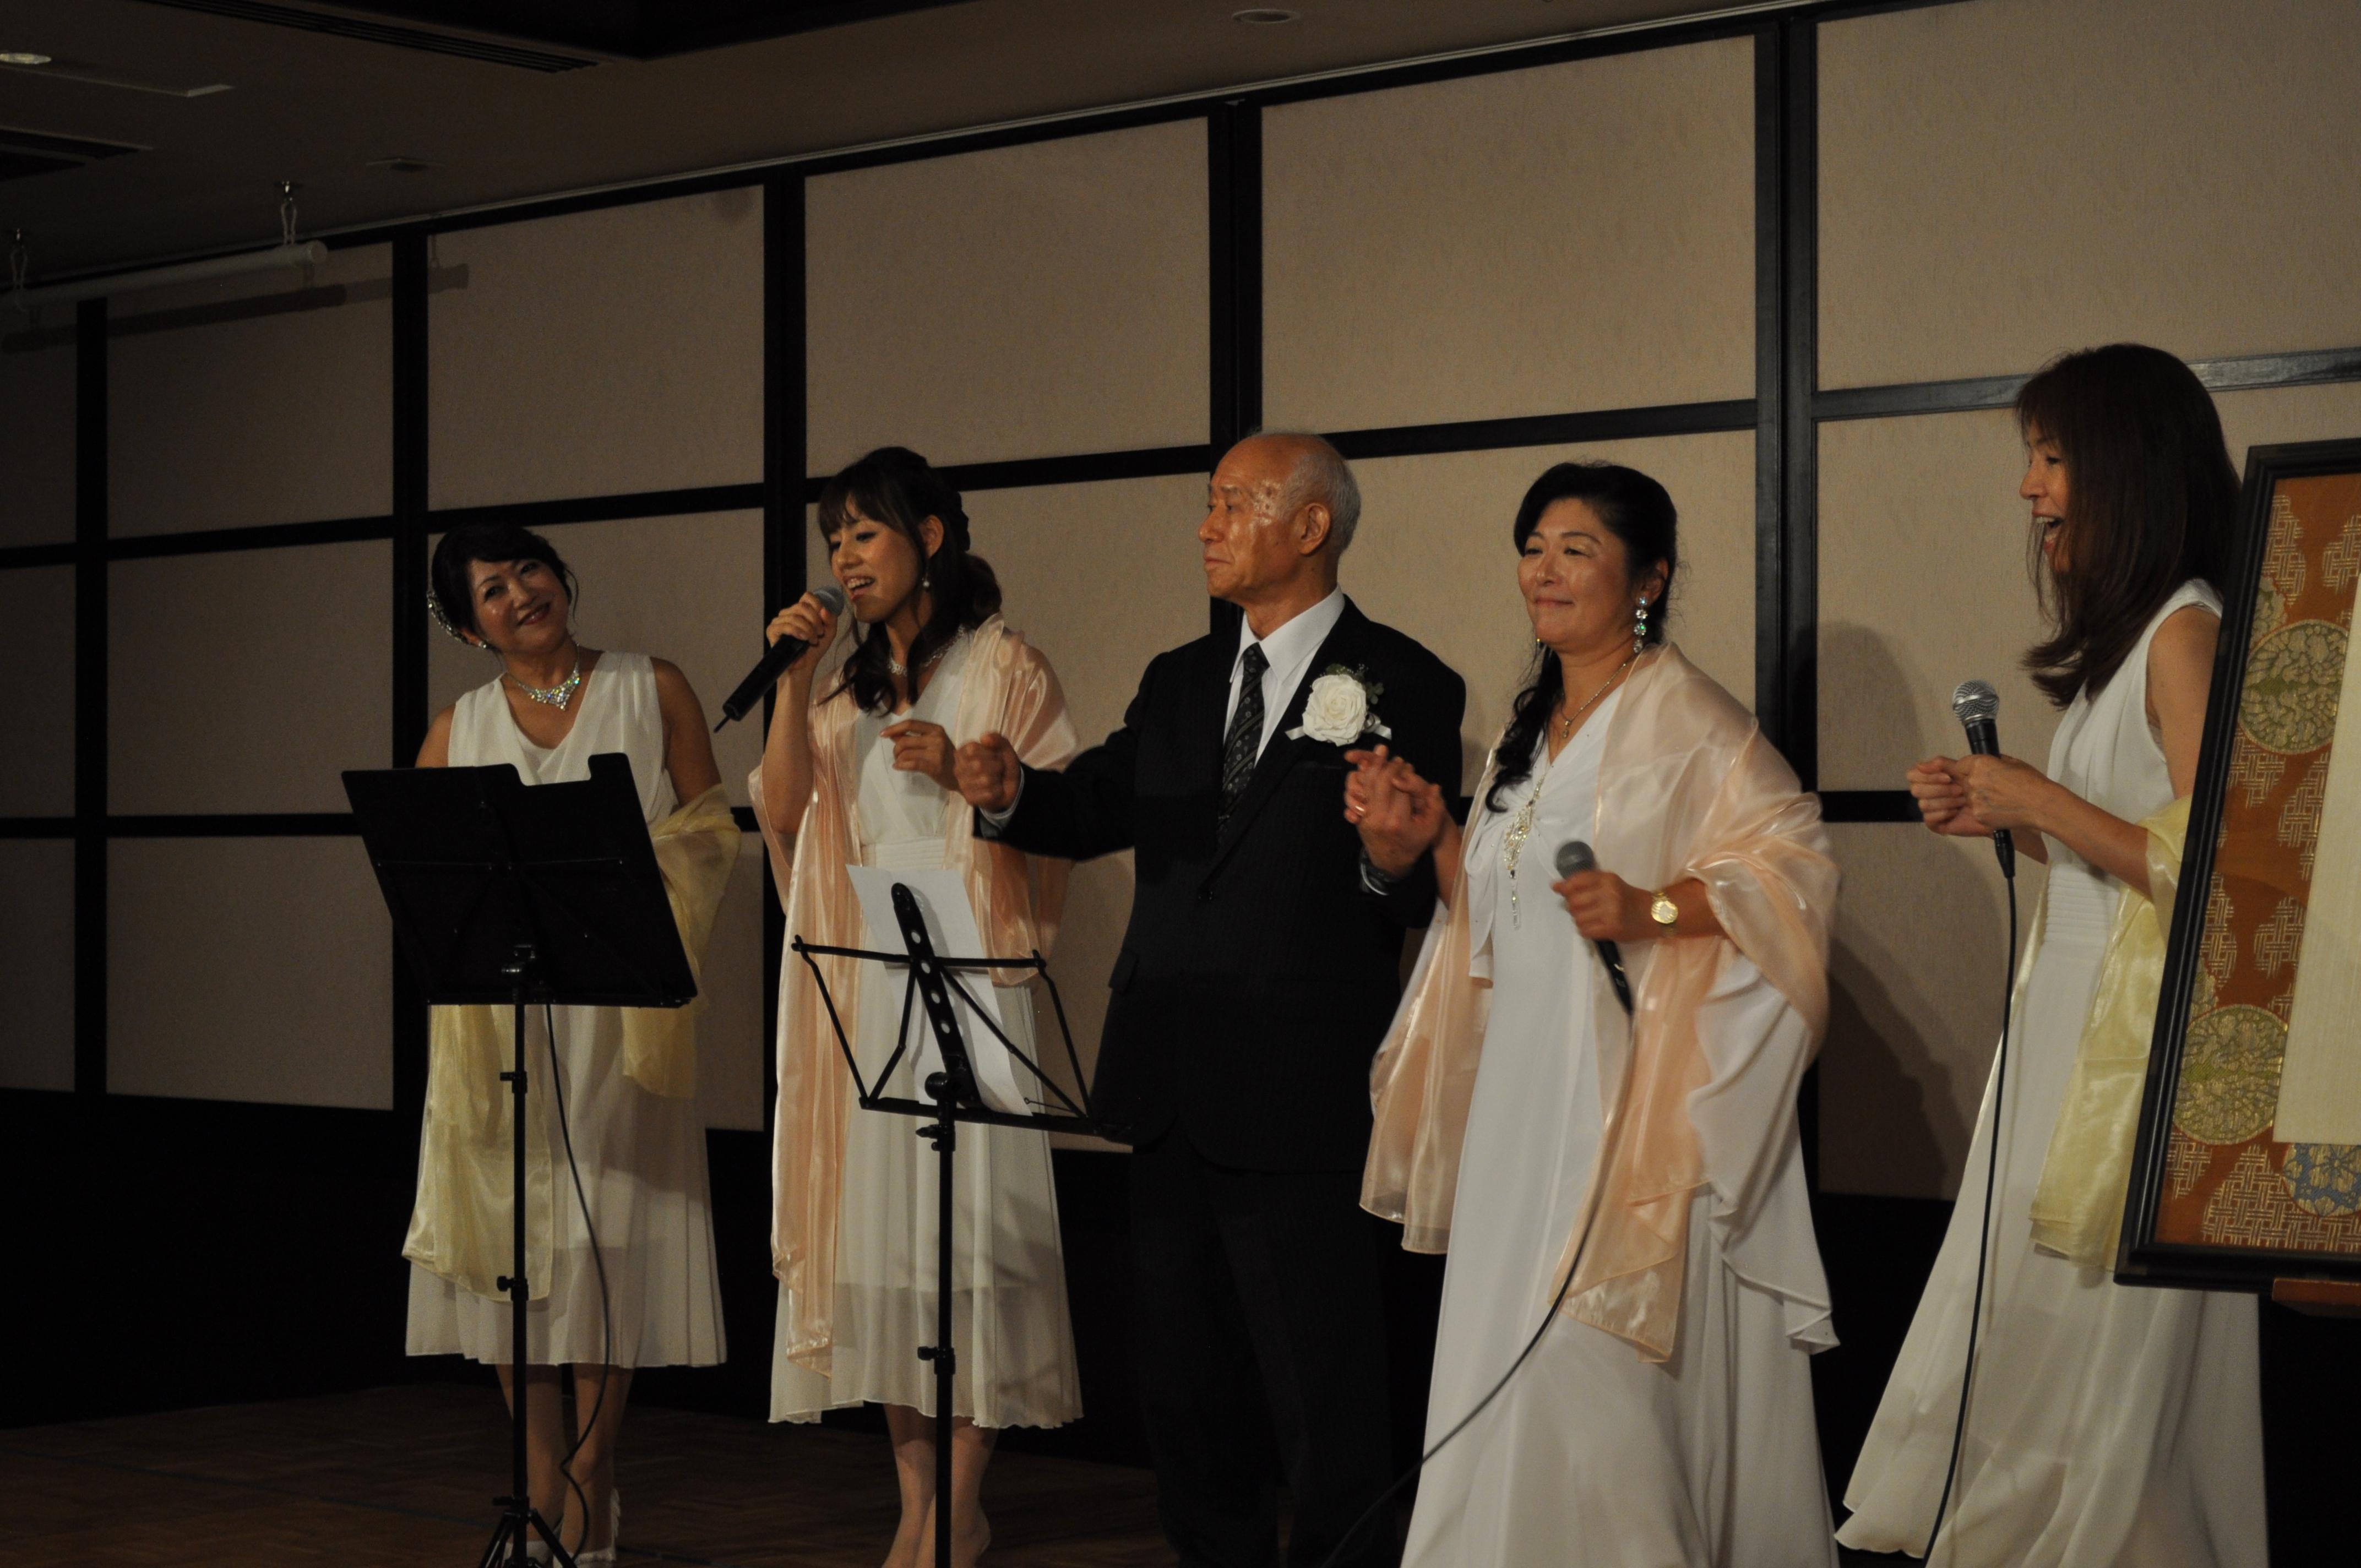 DSC 0532 - 第6回思風会全国大会2018in東京開催